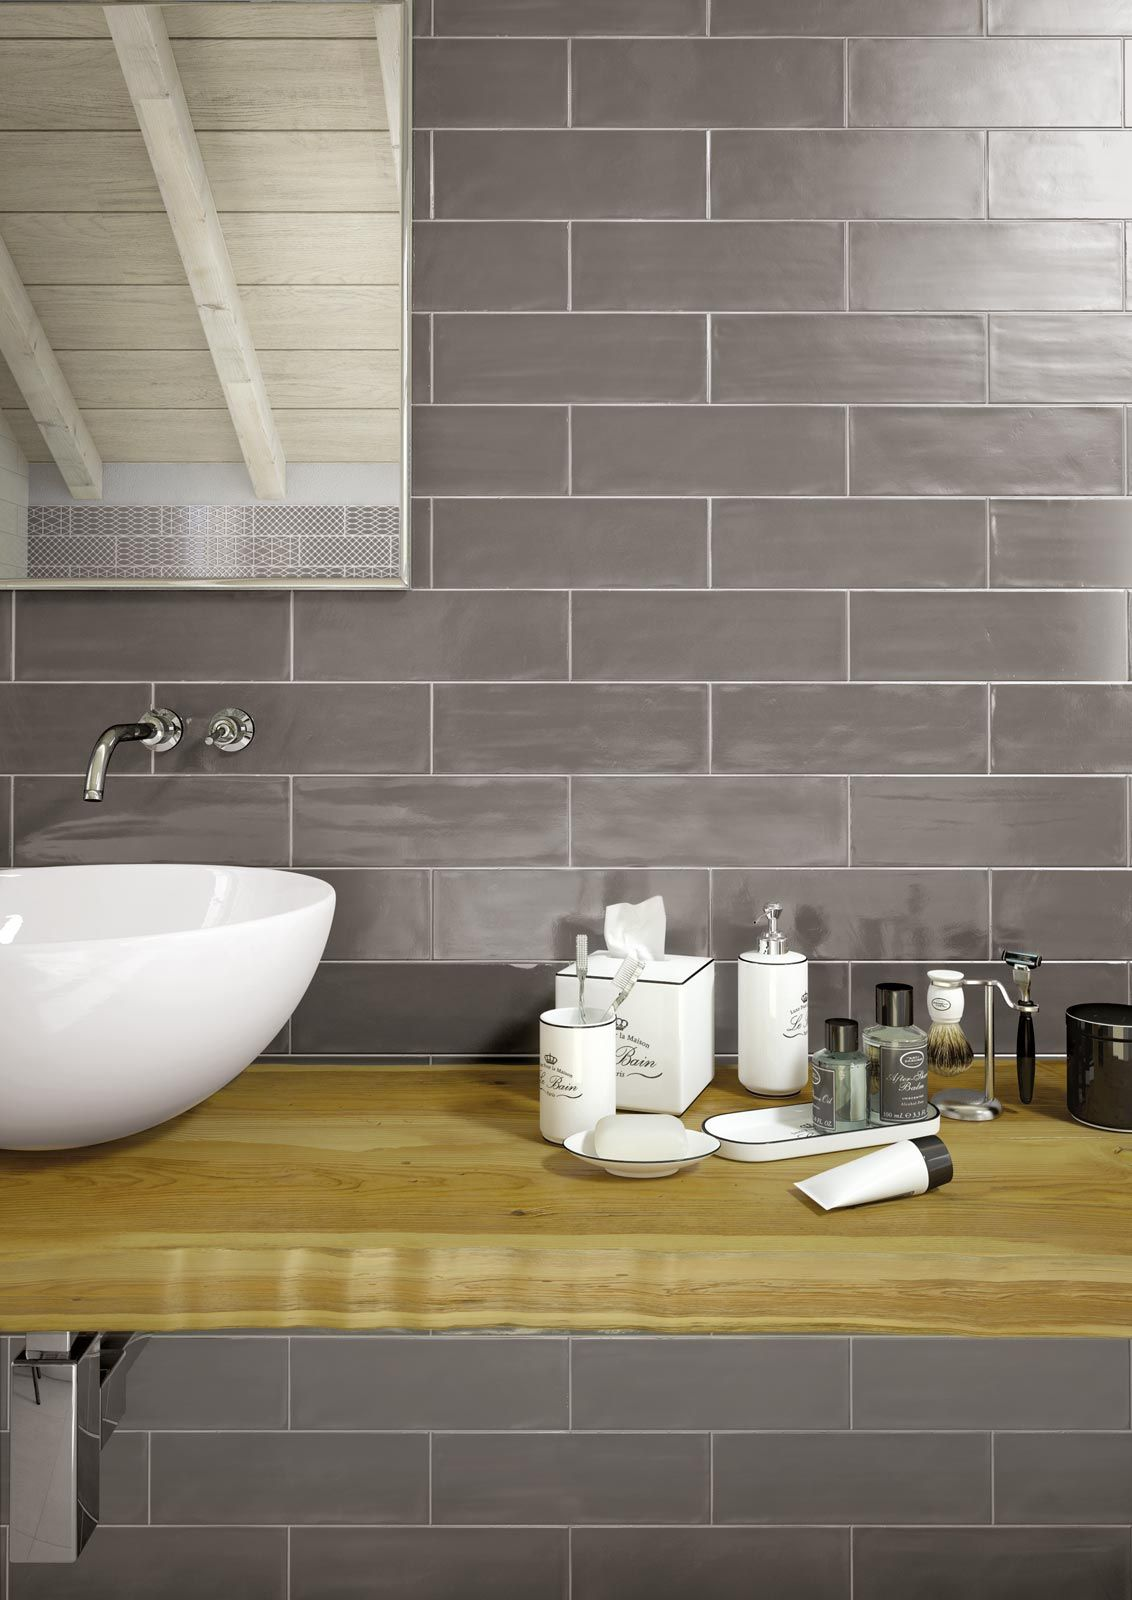 Fine 12X12 Acoustic Ceiling Tiles Tiny 12X12 Vinyl Floor Tile Flat 12X24 Ceramic Floor Tile 2 By 2 Ceiling Tiles Old 2X4 Ceiling Tiles Cheap Yellow2X4 Subway Tile Backsplash PROPOSAL P3   RAGNO   BRICK GLOSSY. Contact Us For More 22 507 000 ..